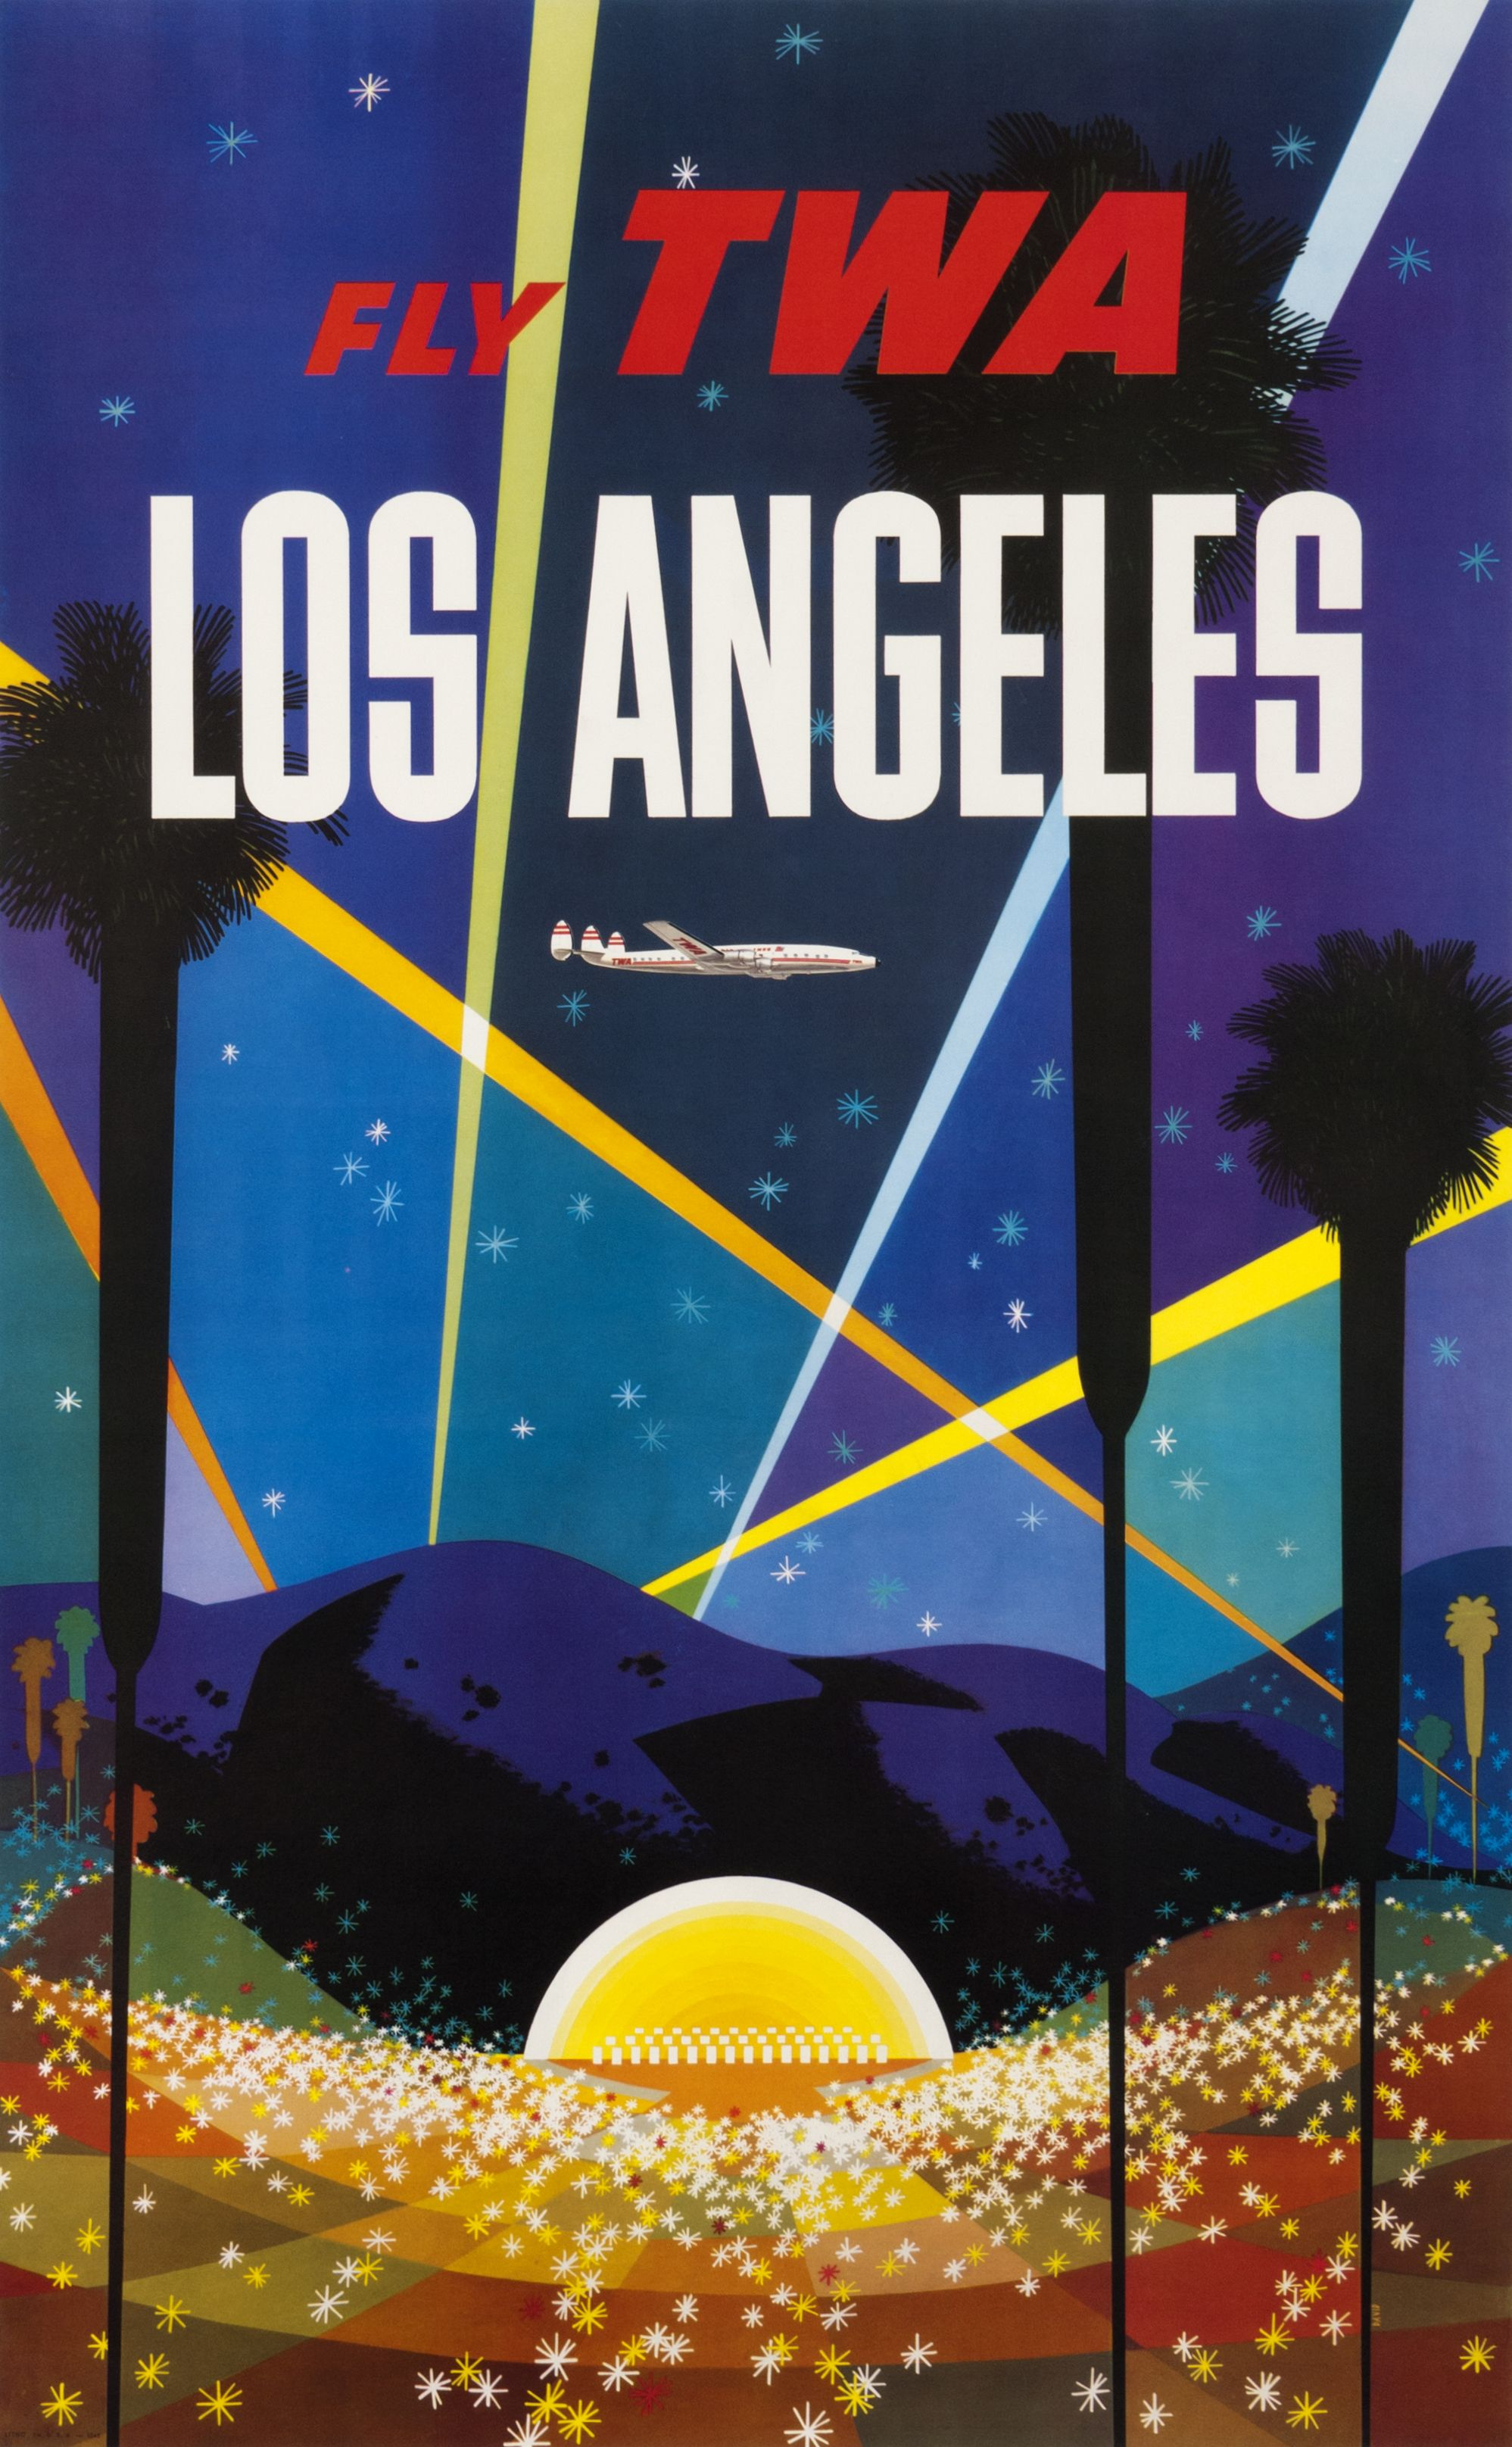 VINTAGE LOS ANGELES TWA TRAVEL A3 POSTER PRINT